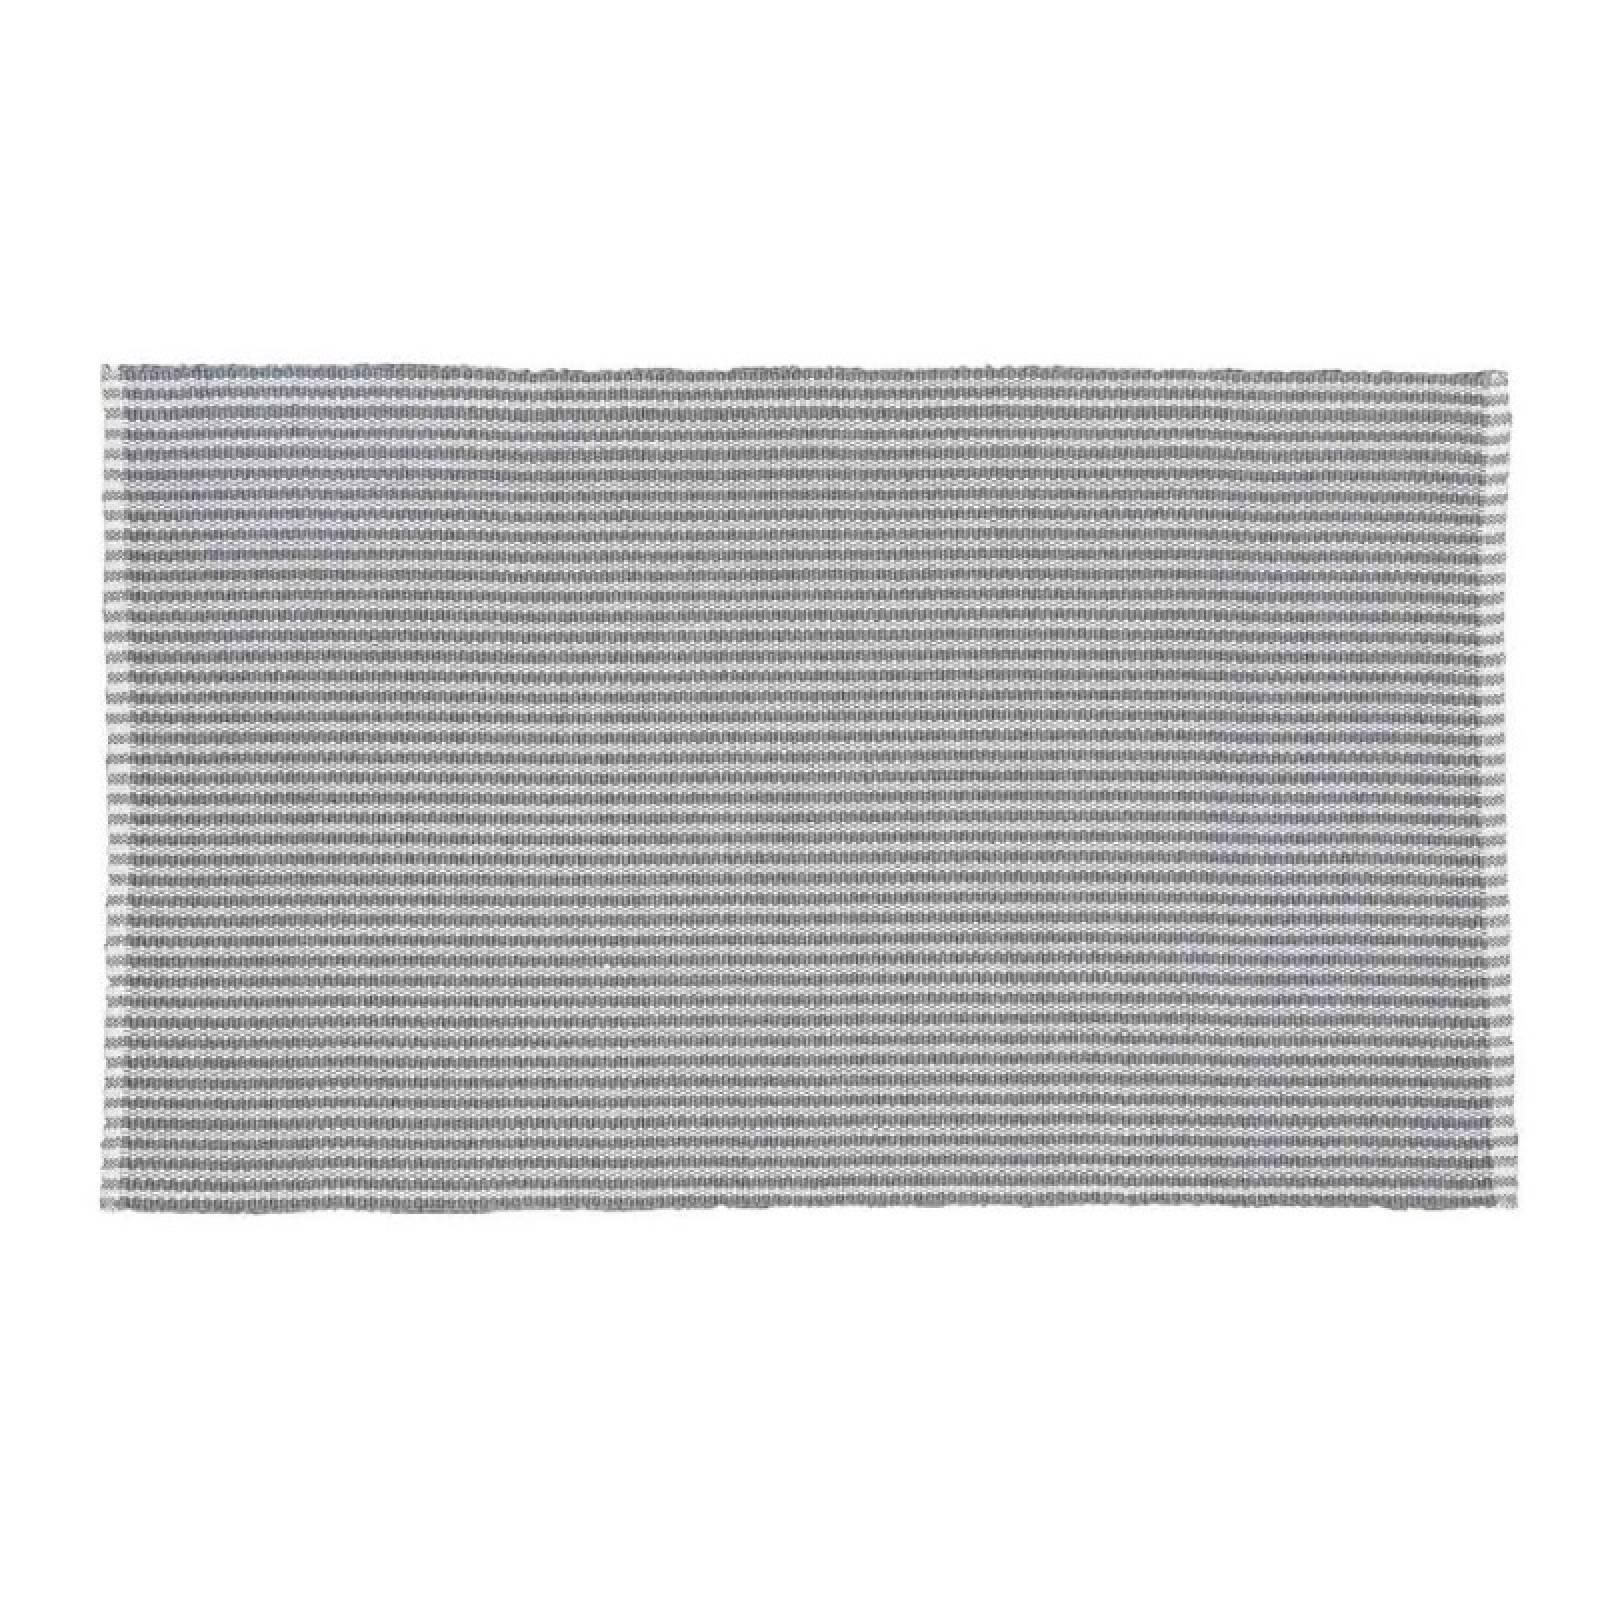 Polperro Stripe In Dove Grey 110x60cm Recycled Bottle Rug thumbnails